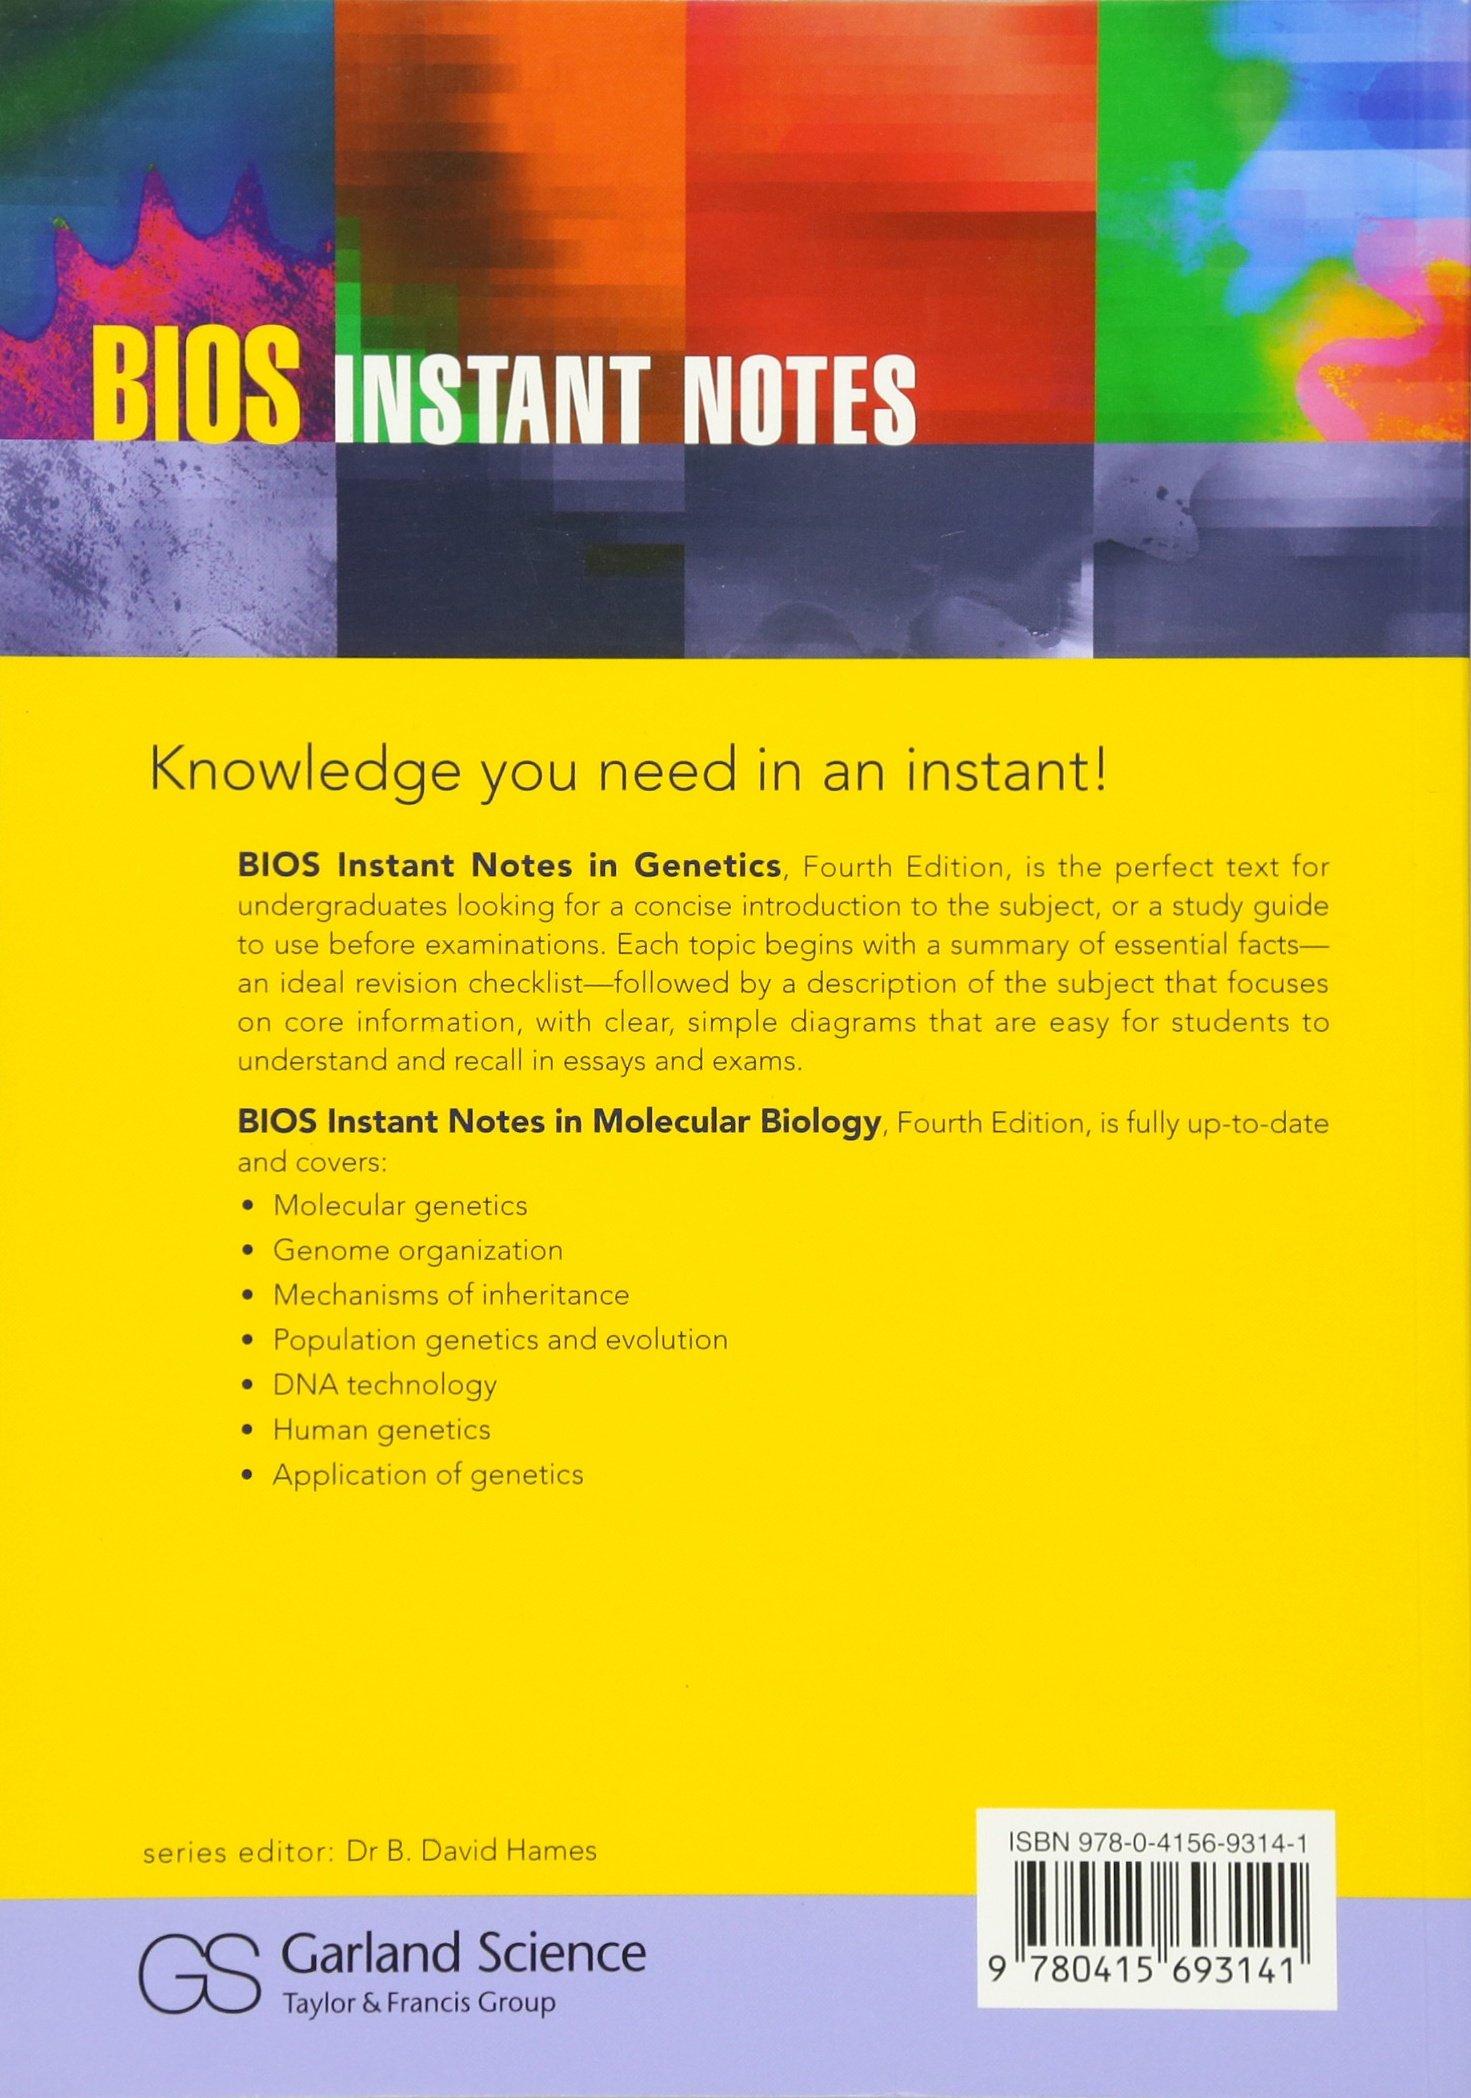 BIOS Instant Notes in Genetics e-book downloads